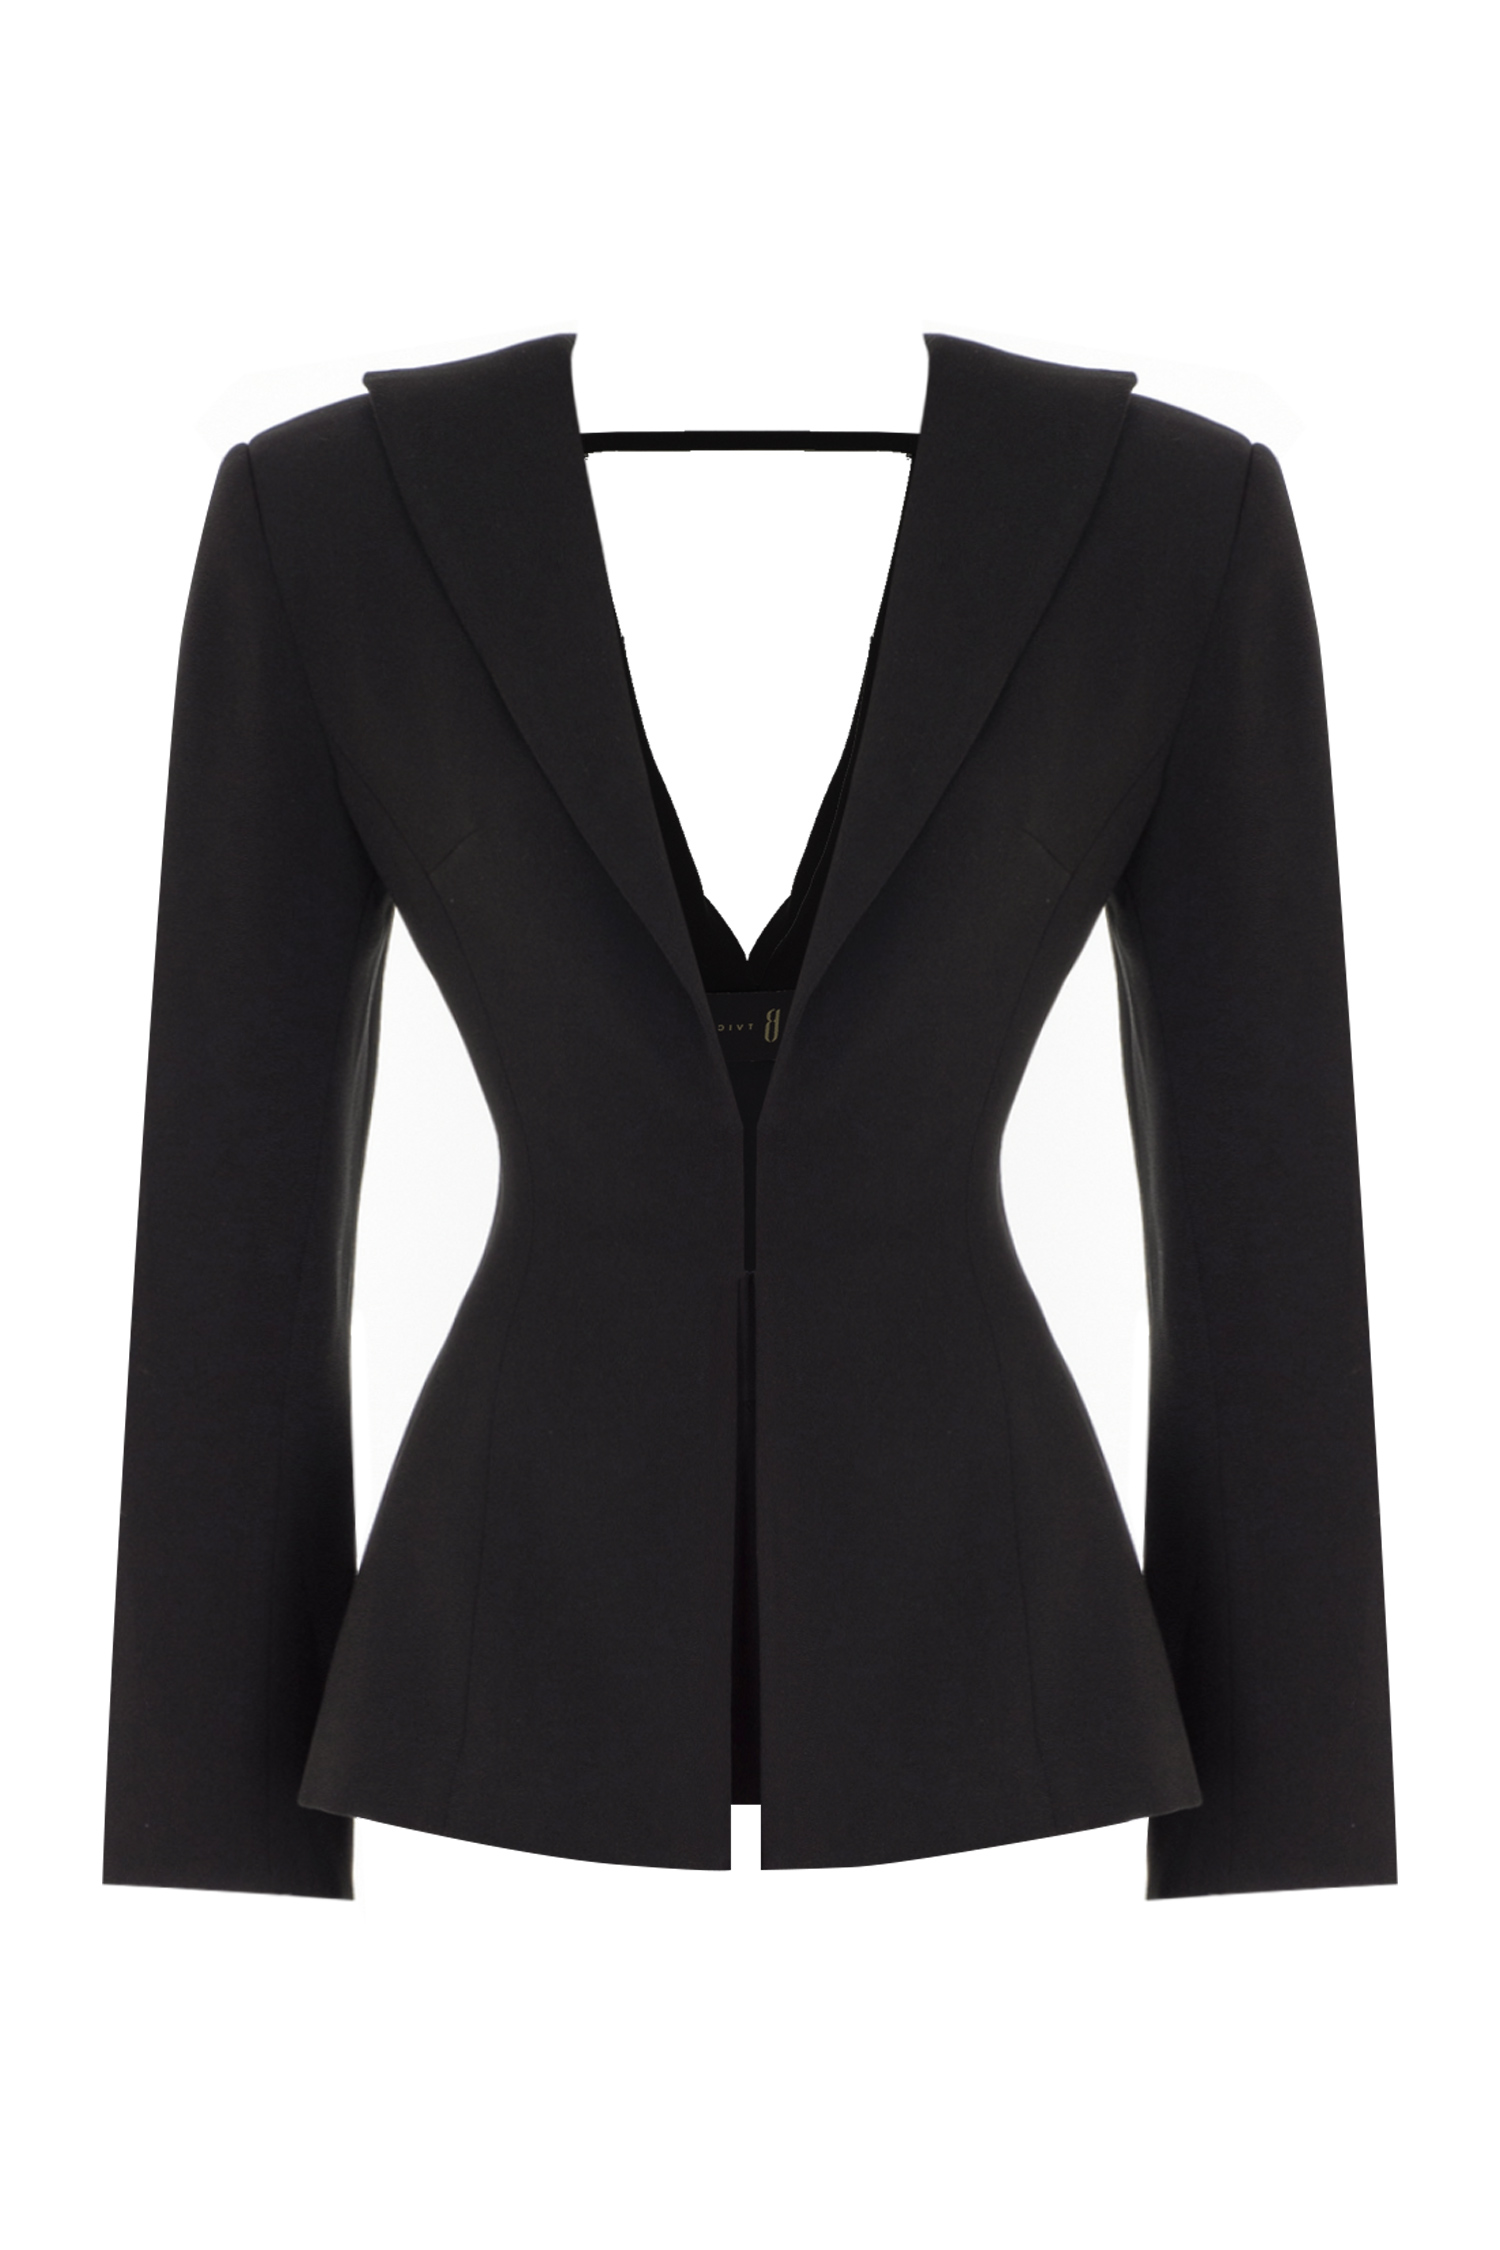 blazer, black suit